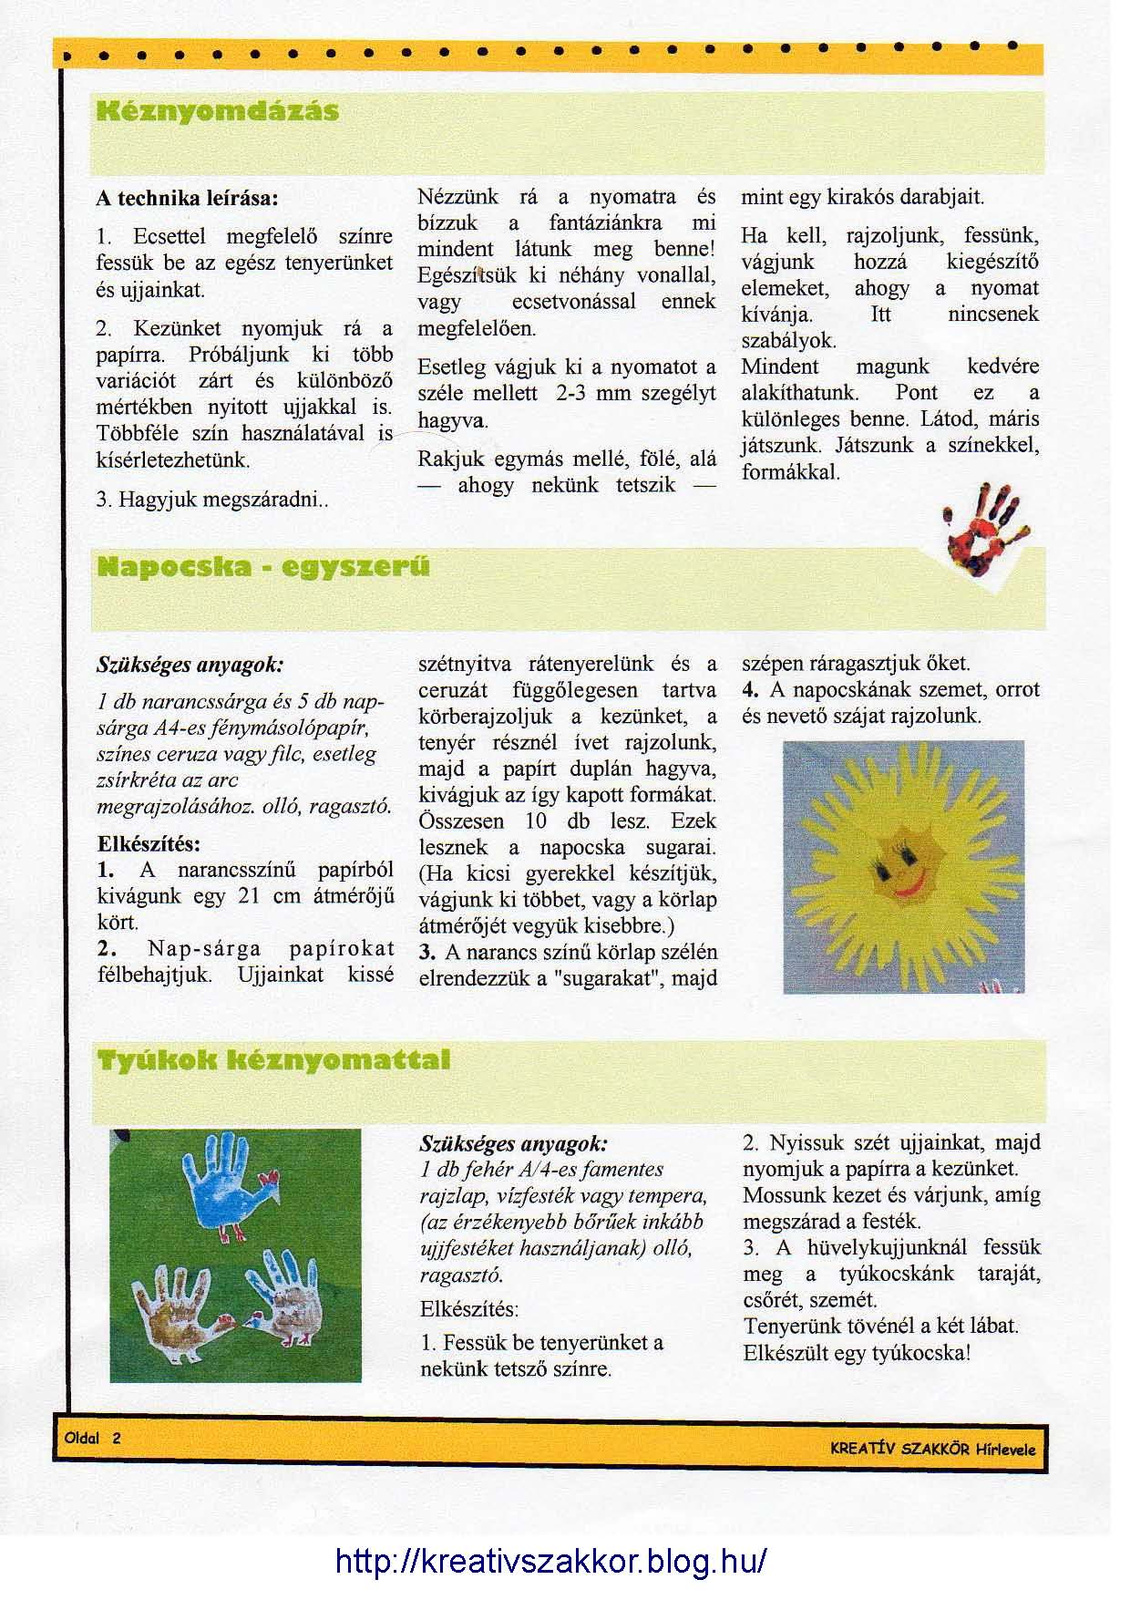 B.B.M: KREATÍV SZAKKÖR Hírlevele 1-1 Page 2